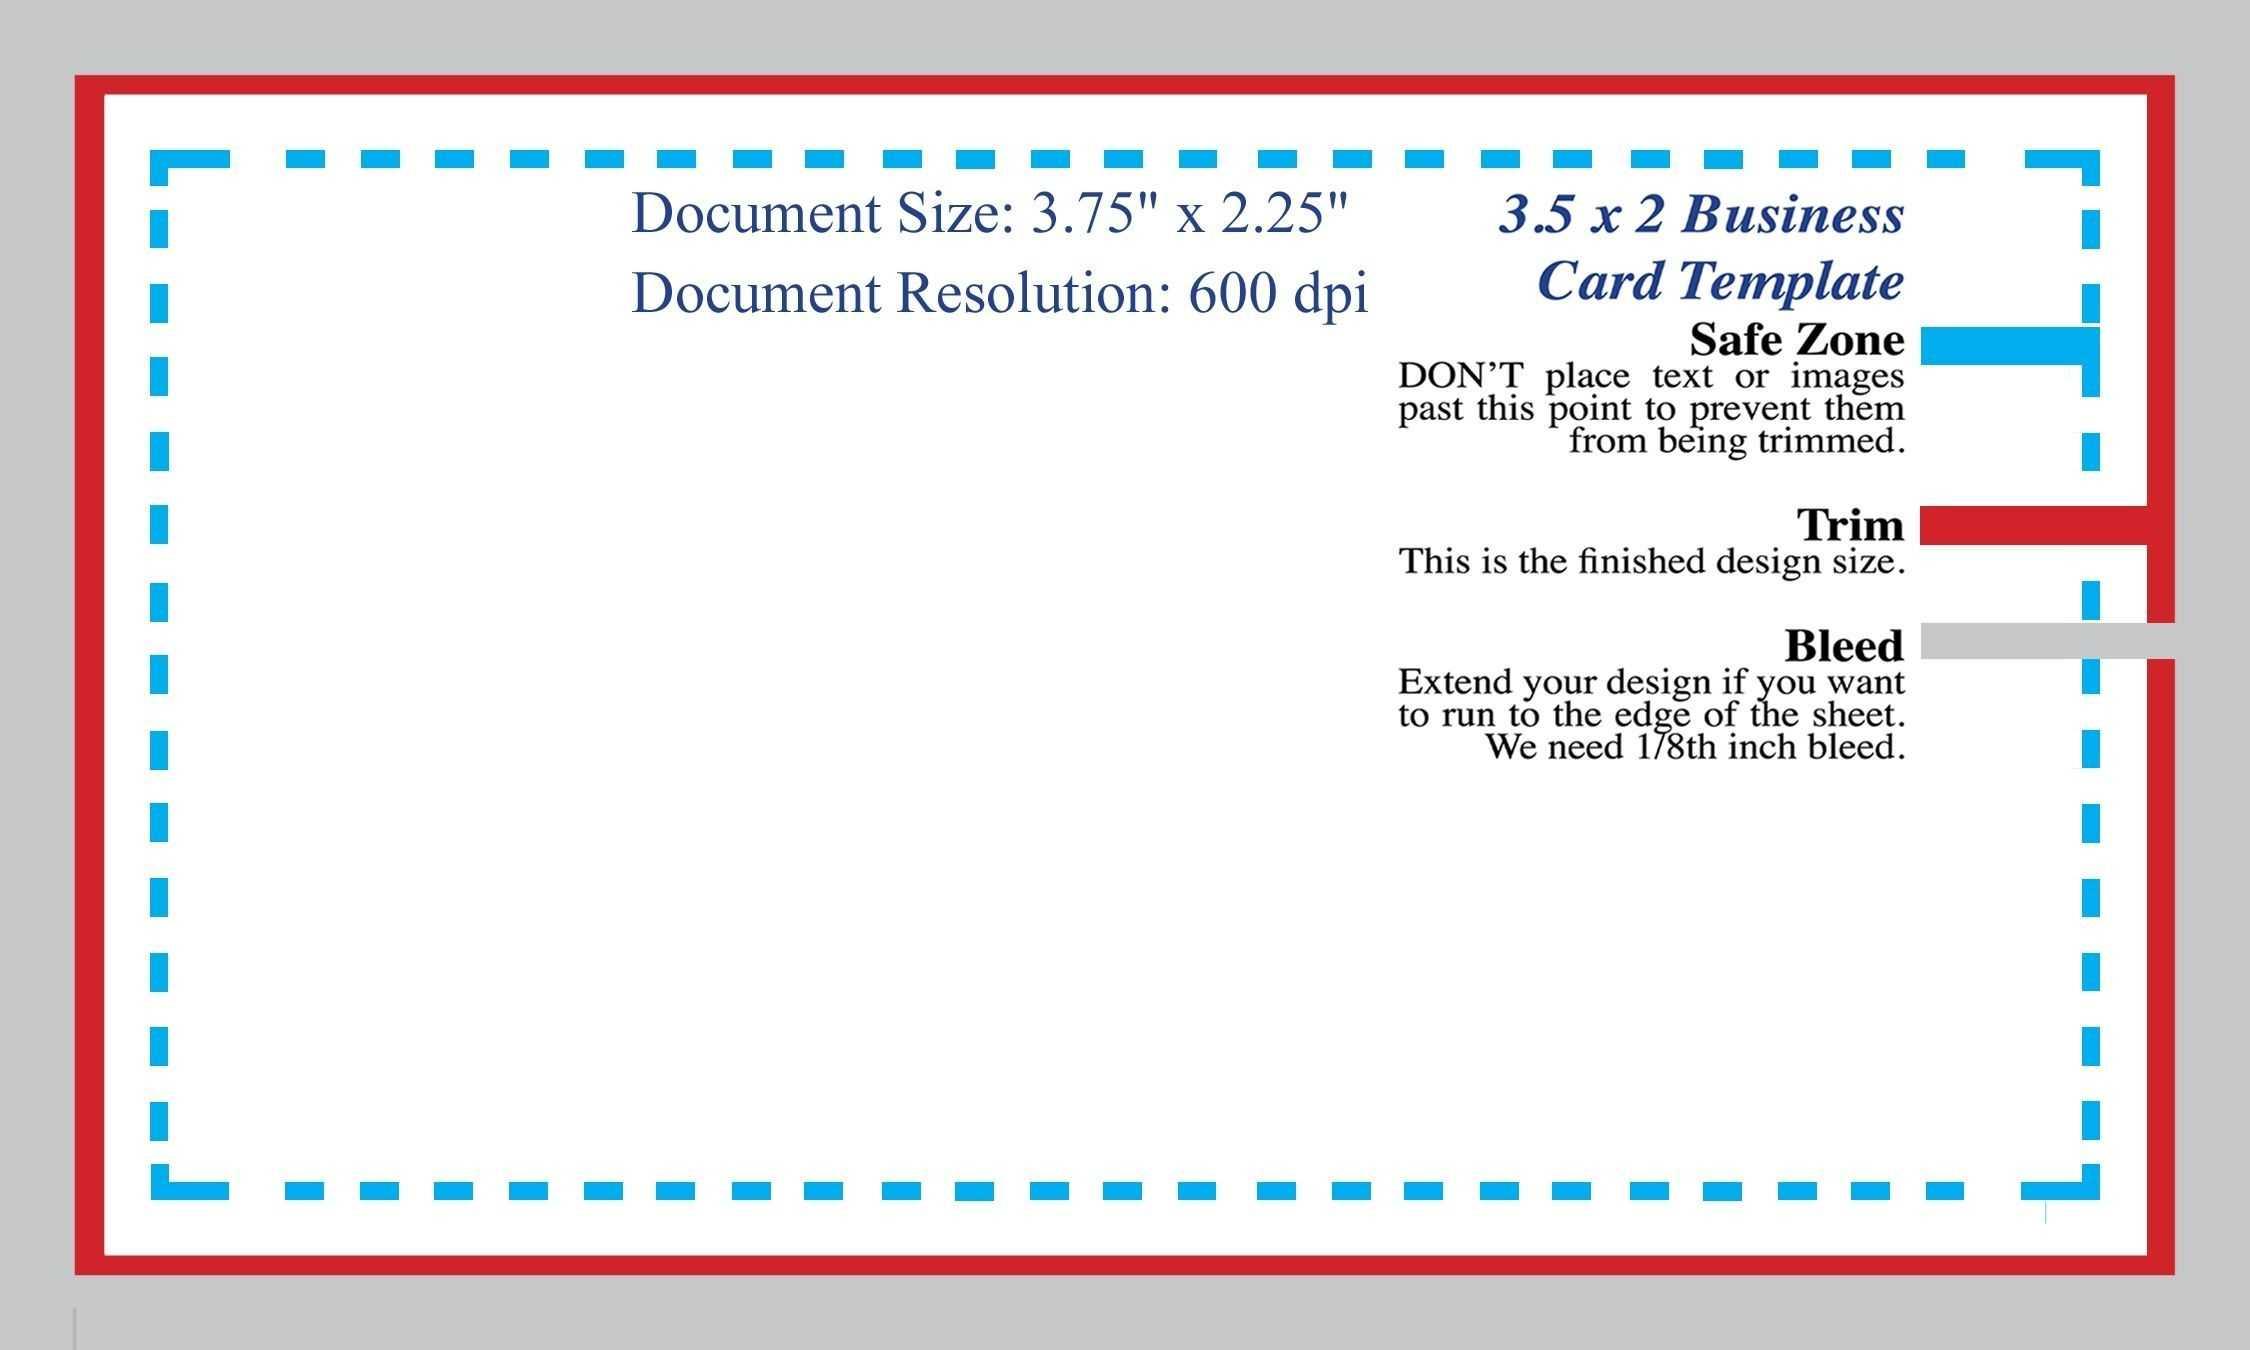 Standard Business Card Blank Template Photoshop Template Inside Business Card Size Template Photoshop